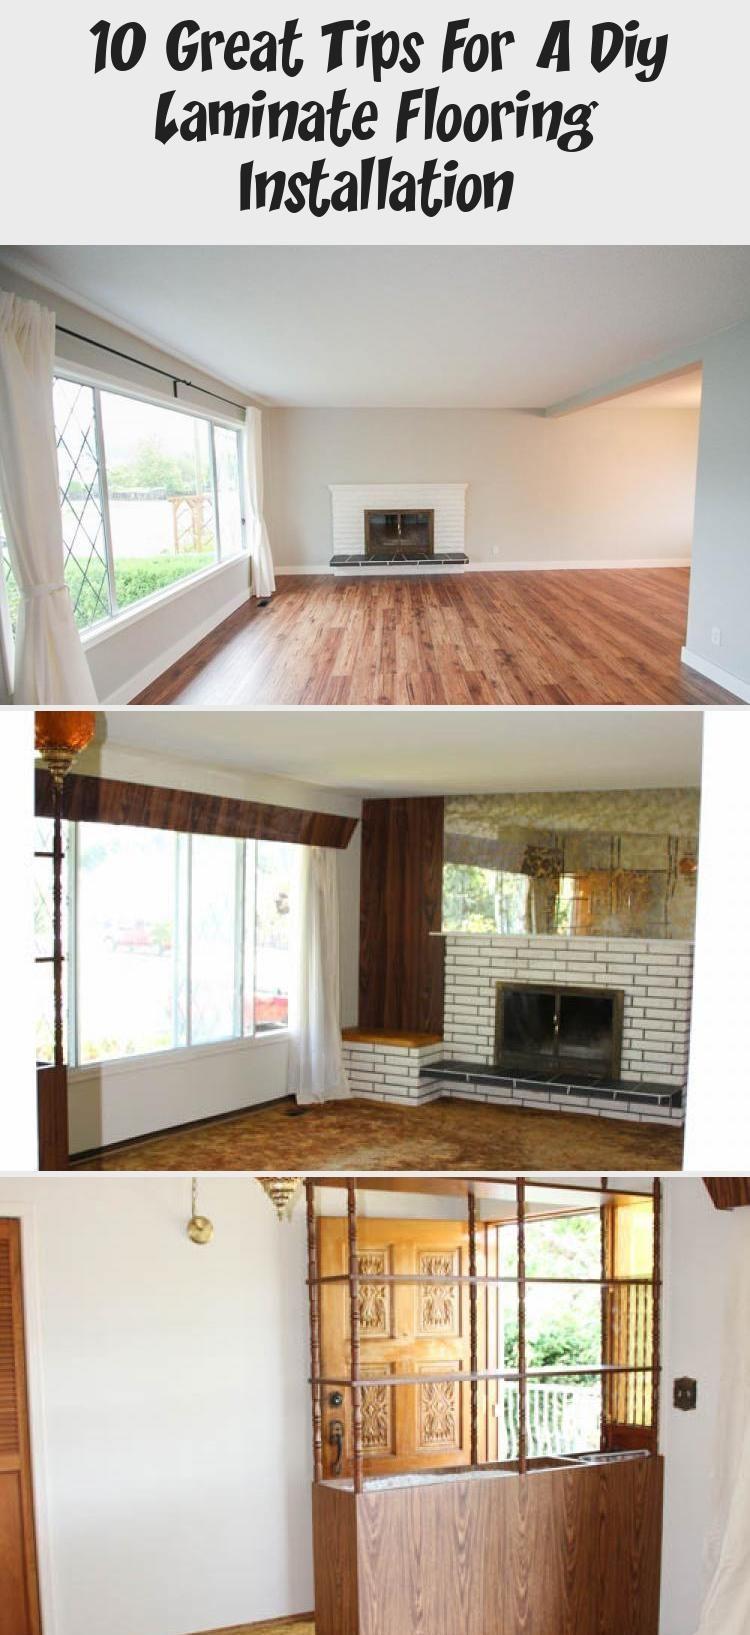 10 Great Tips For A Diy Laminate Flooring Installation Pinokyo In 2020 Floor Installation Laminate Flooring Flooring